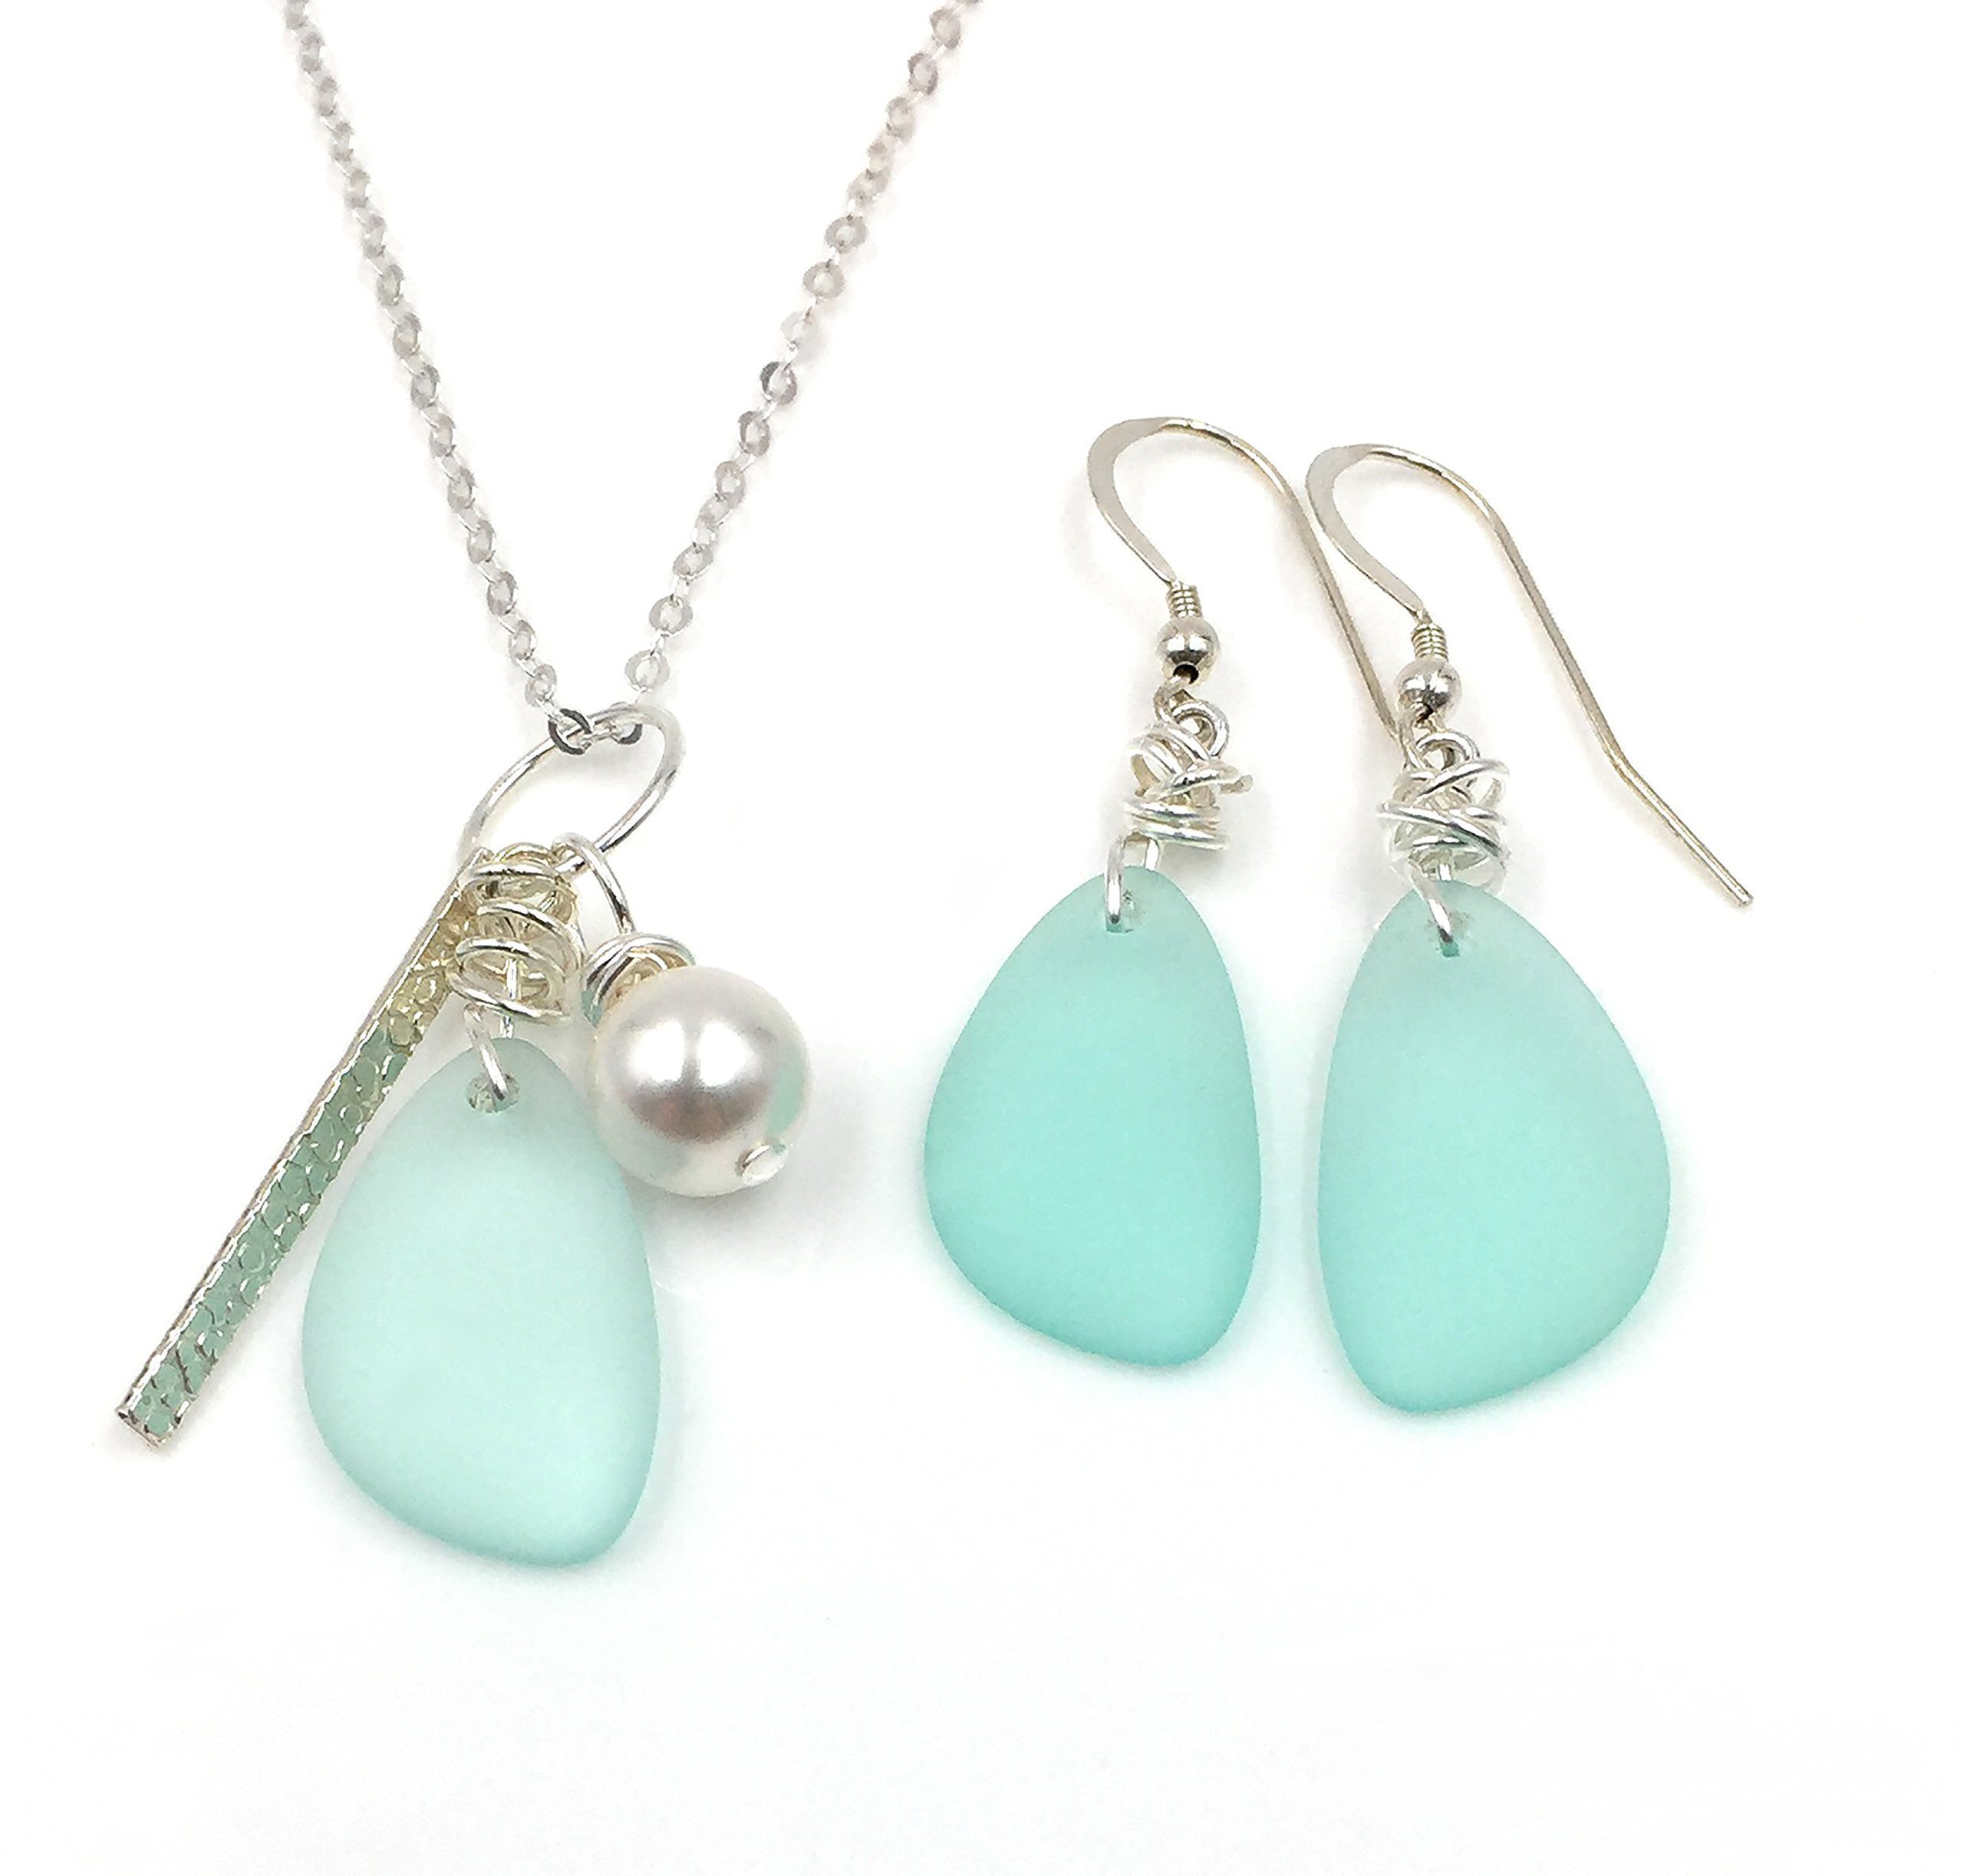 Best Seller! Beach Gift SET Sea Foam GREEN Sea Glass Earrings on Sterling Silver Hooks with Sea Glass, Swarovski Pearl, Silver Bar Charm Necklace on Sterling Silver Chain, by Aimee Tresor